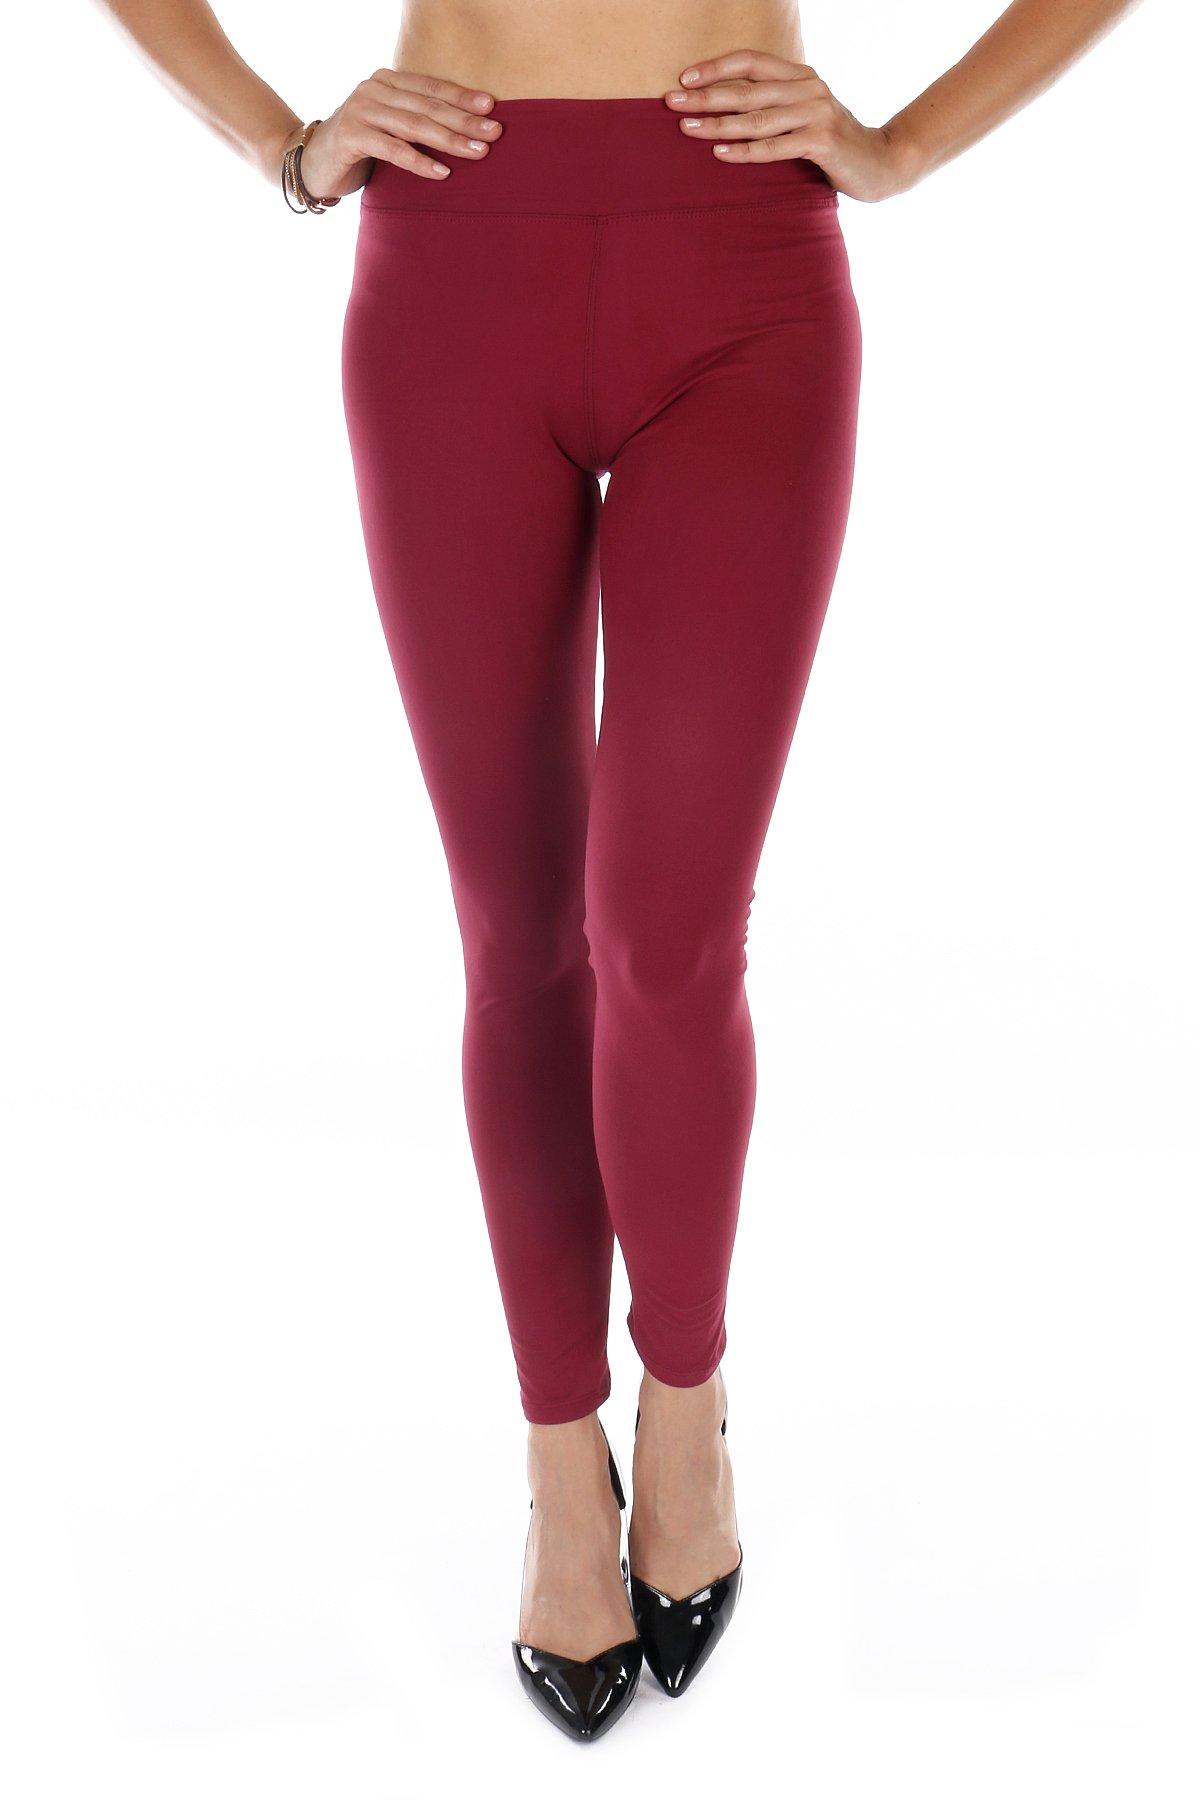 TODAY SHOWROOM Silky Soft Non See Thru High Waist Premium Yoga Leggings (Plus Size(12-22), Mulberry)